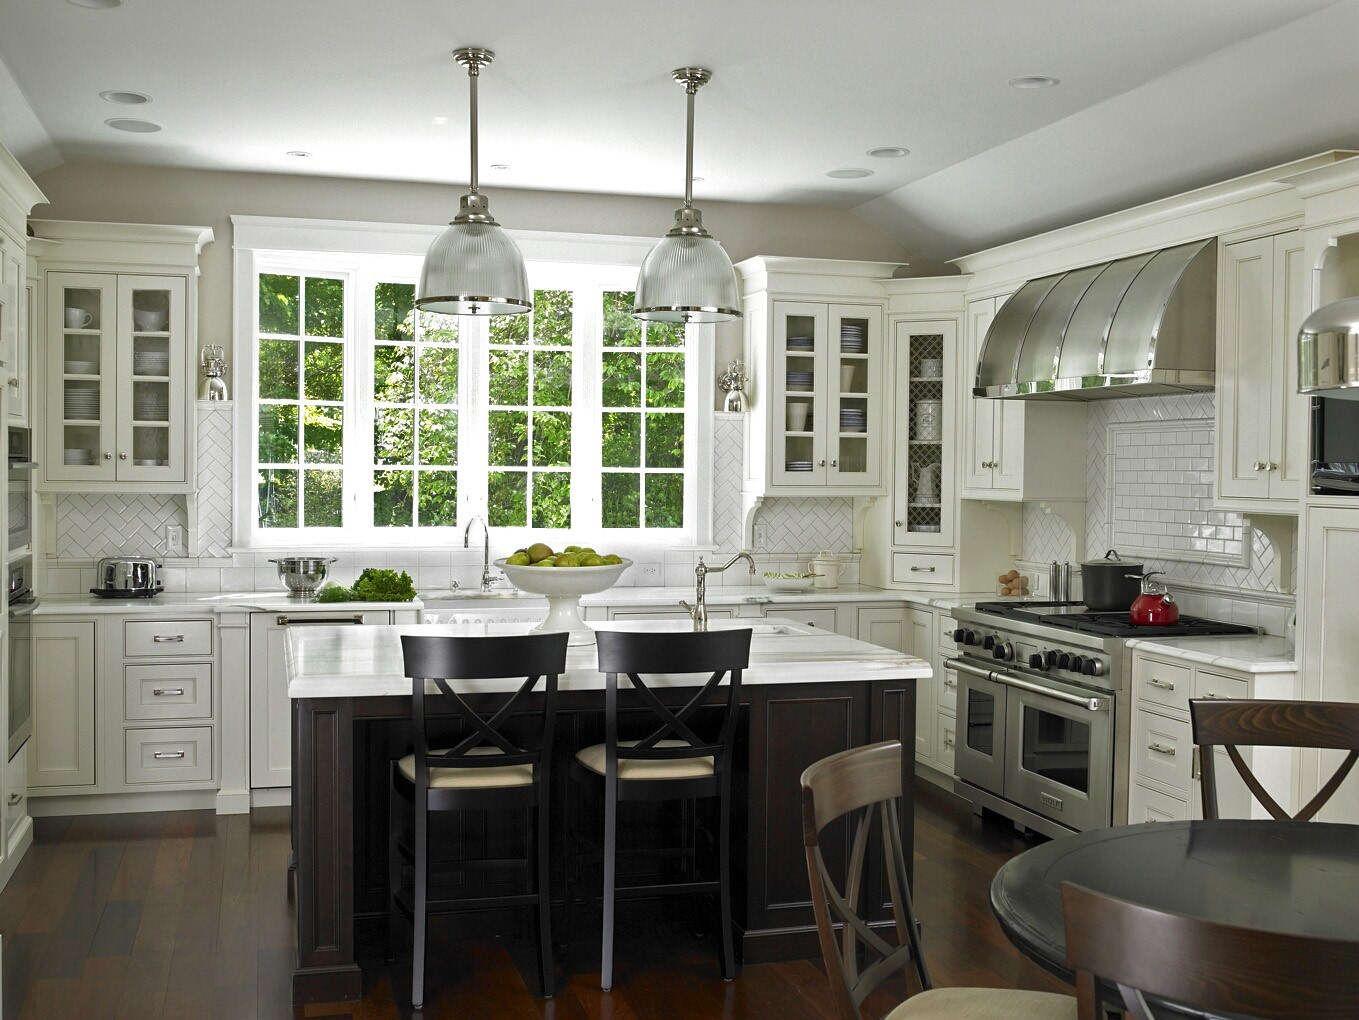 White Kitchen Cabinets Furnished Subway Tile Backsplash Ideas Cream Pictures Kitchens Best Free Home Design Idea